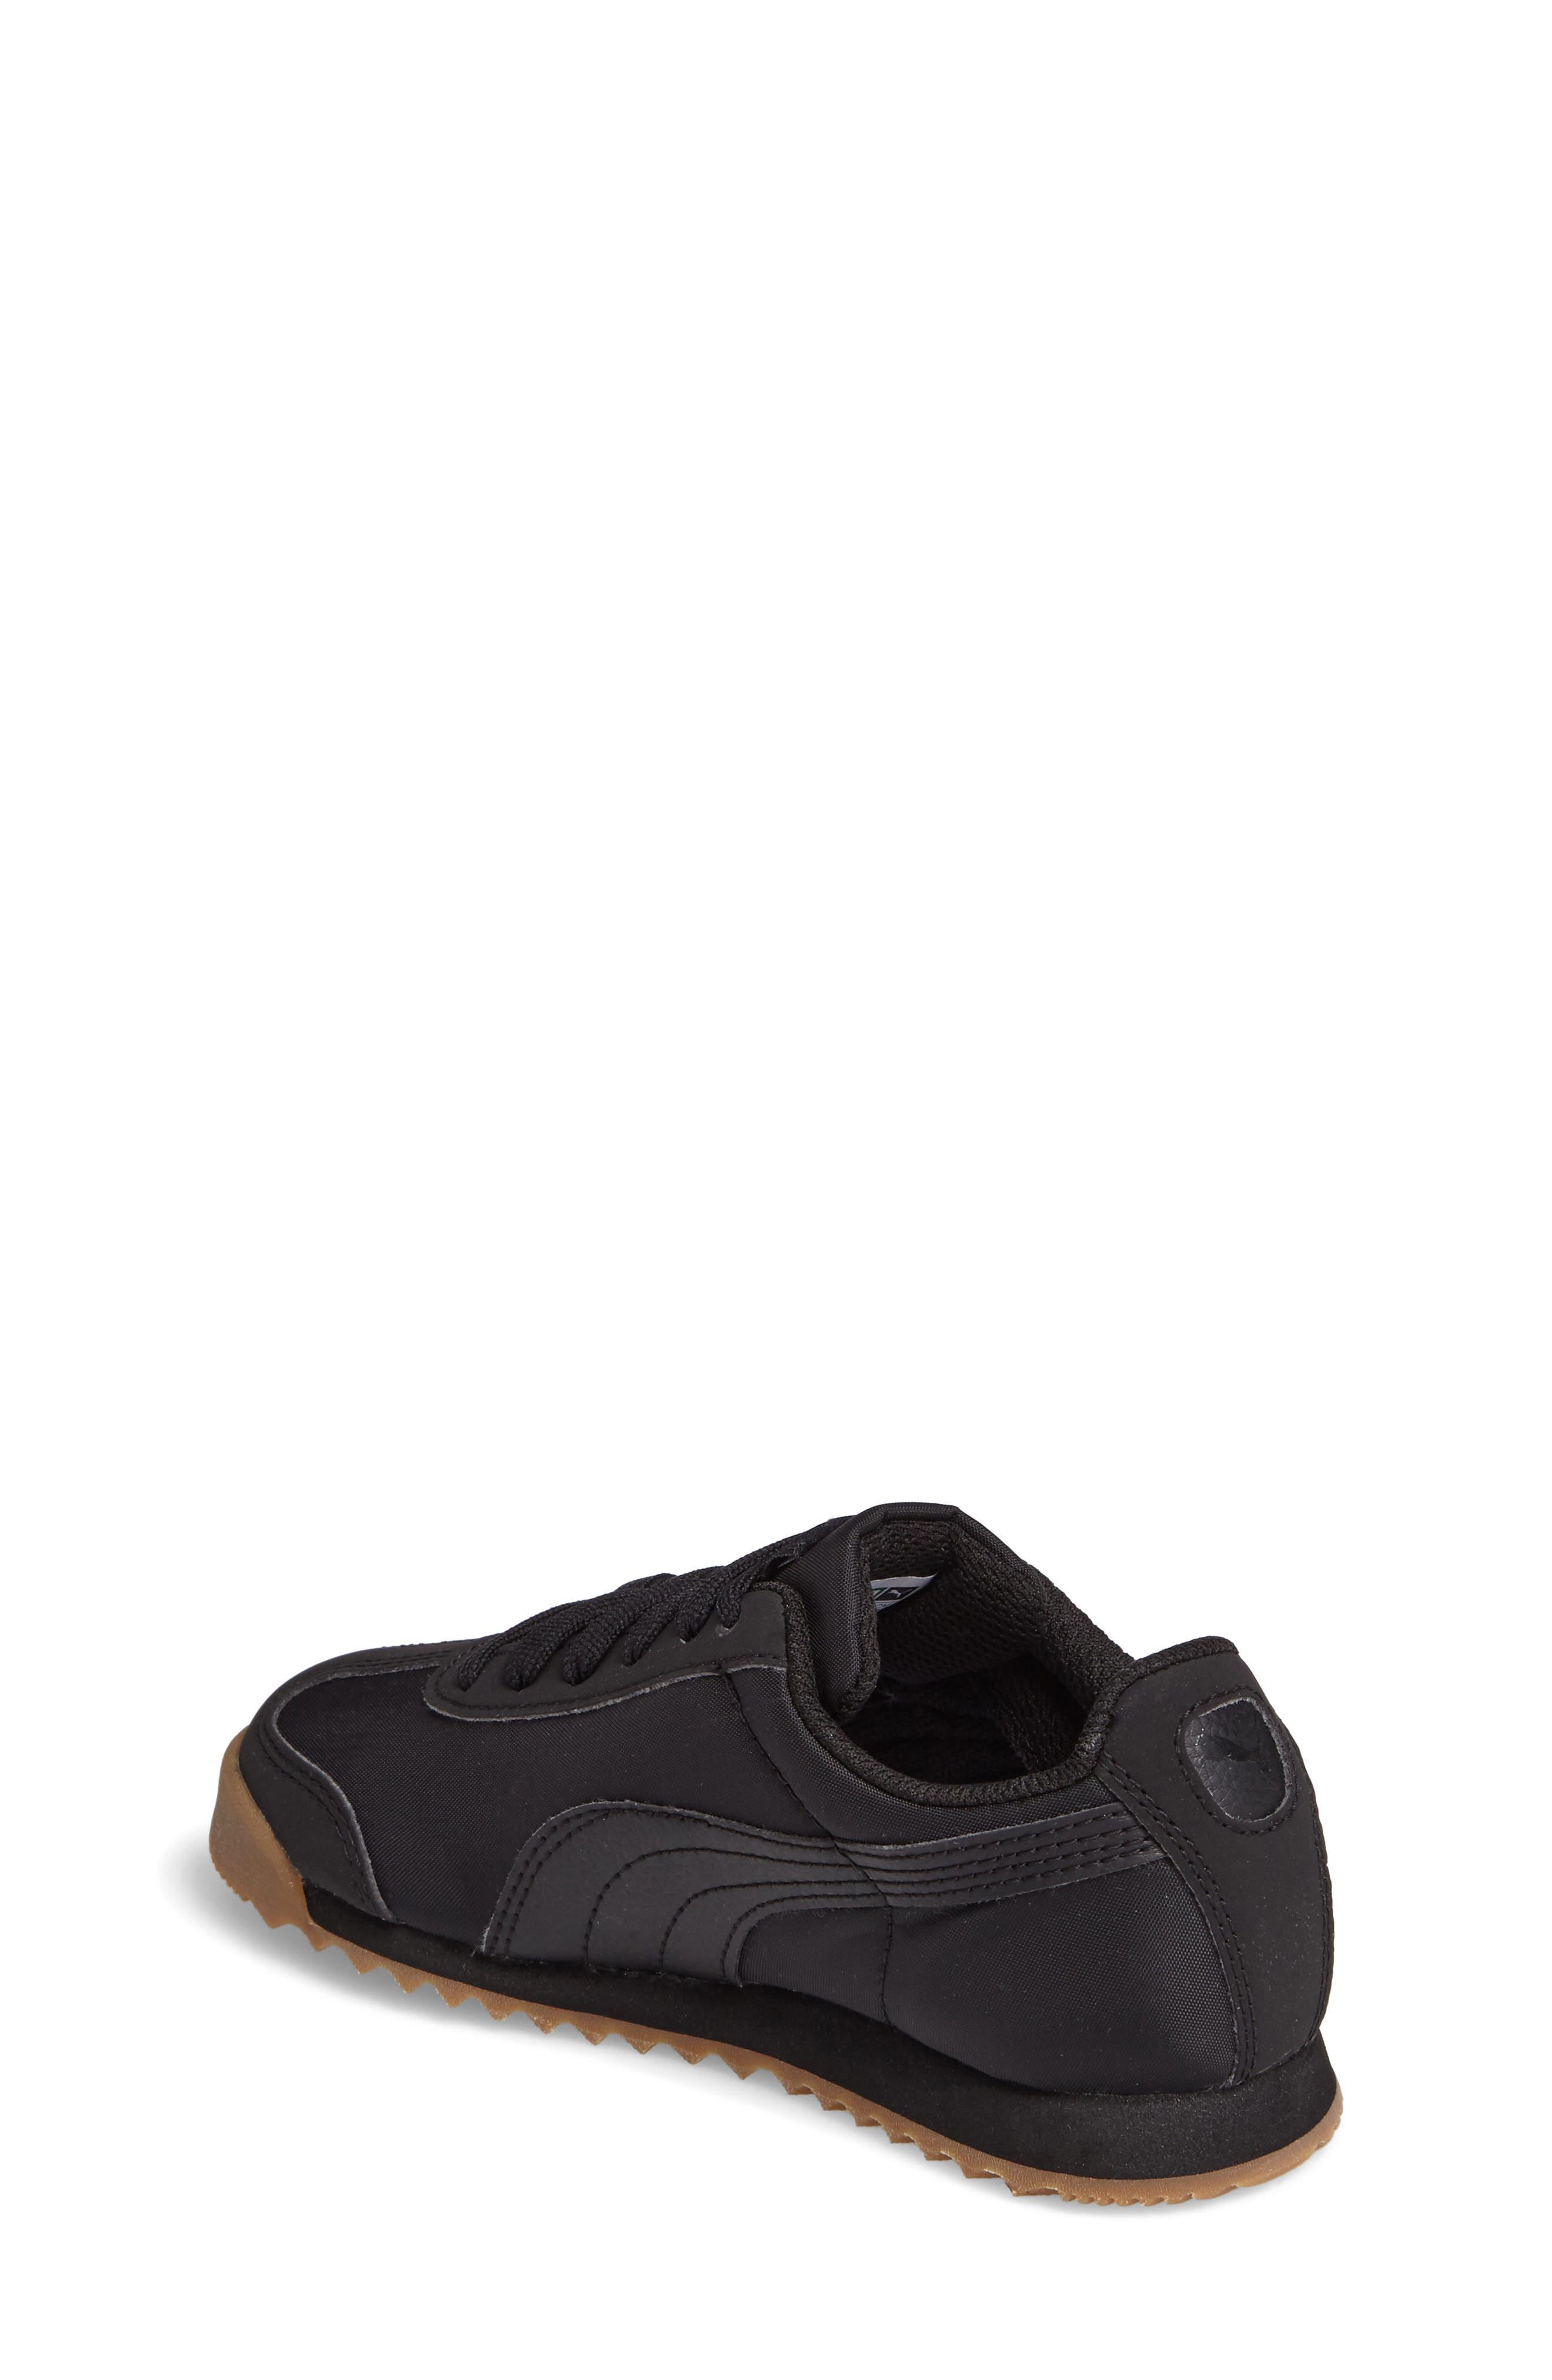 Alternate Image 2  - Puma Roma Basic Summer Sneaker (Toddler, Little Kid & Big Kid)